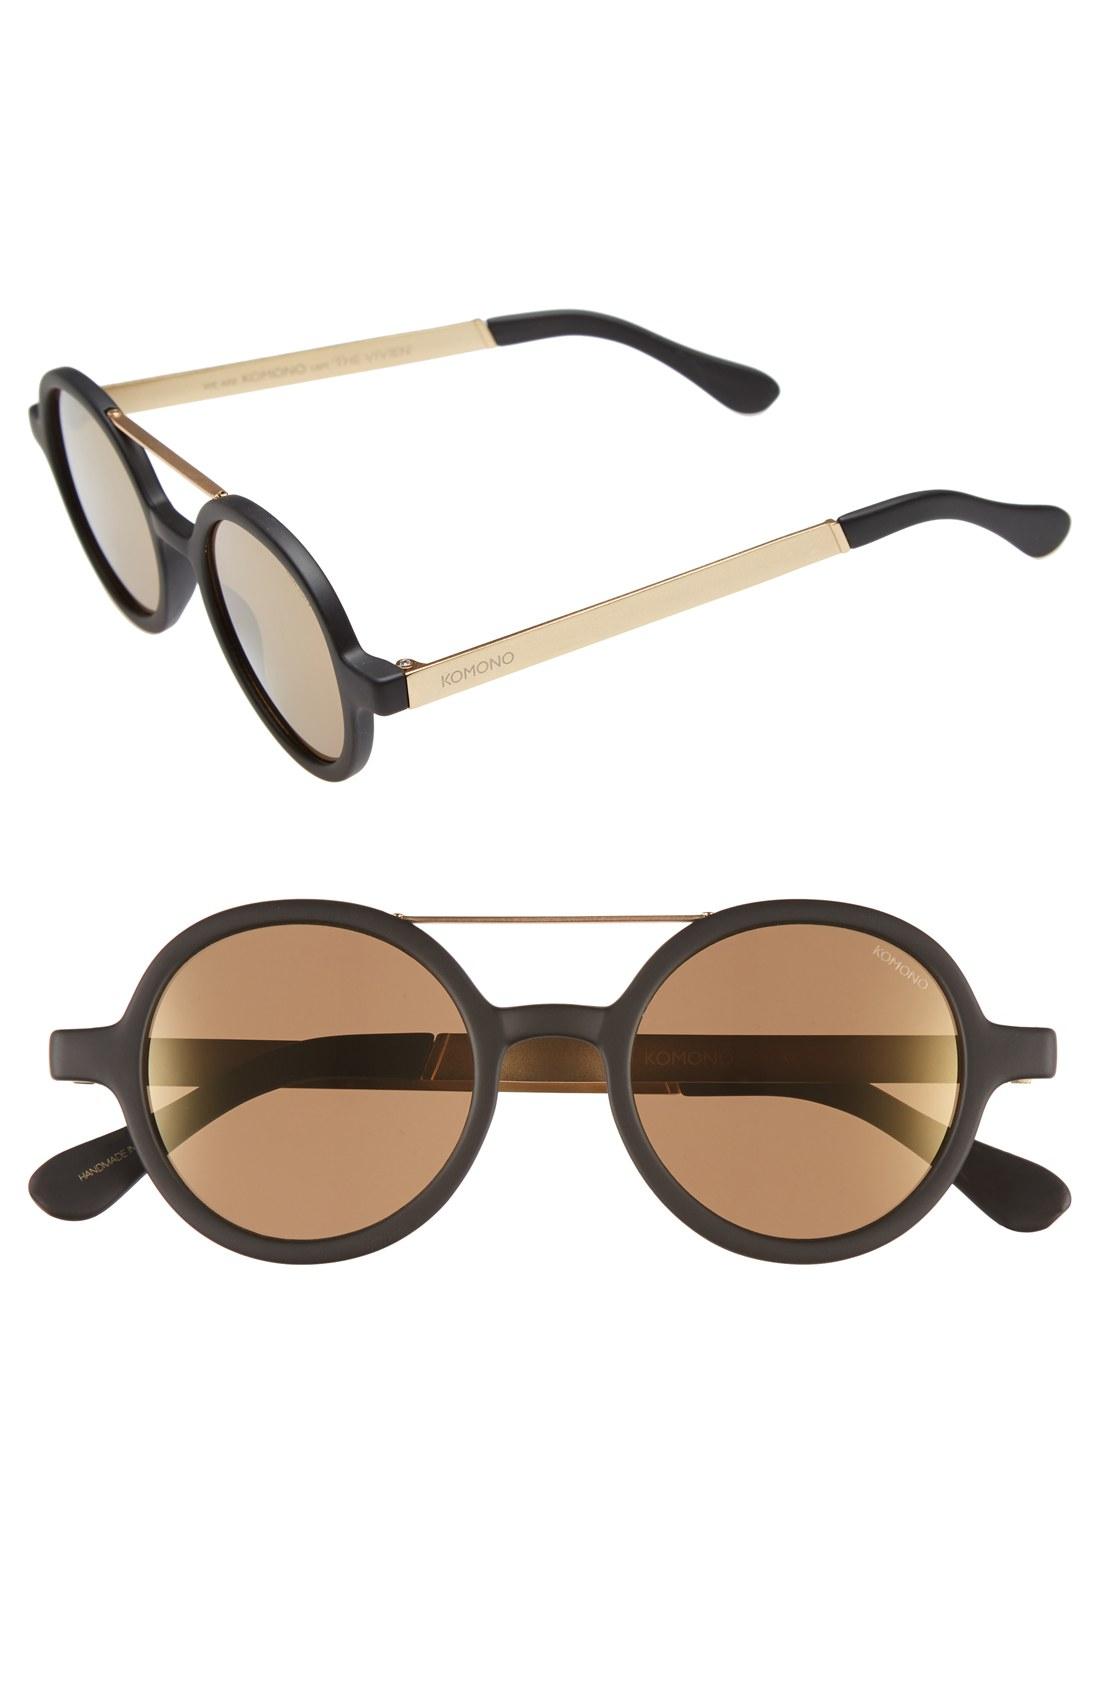 d5394ed65 Komono 'Vivien' Round Lens Sunglasses | Nordstrom